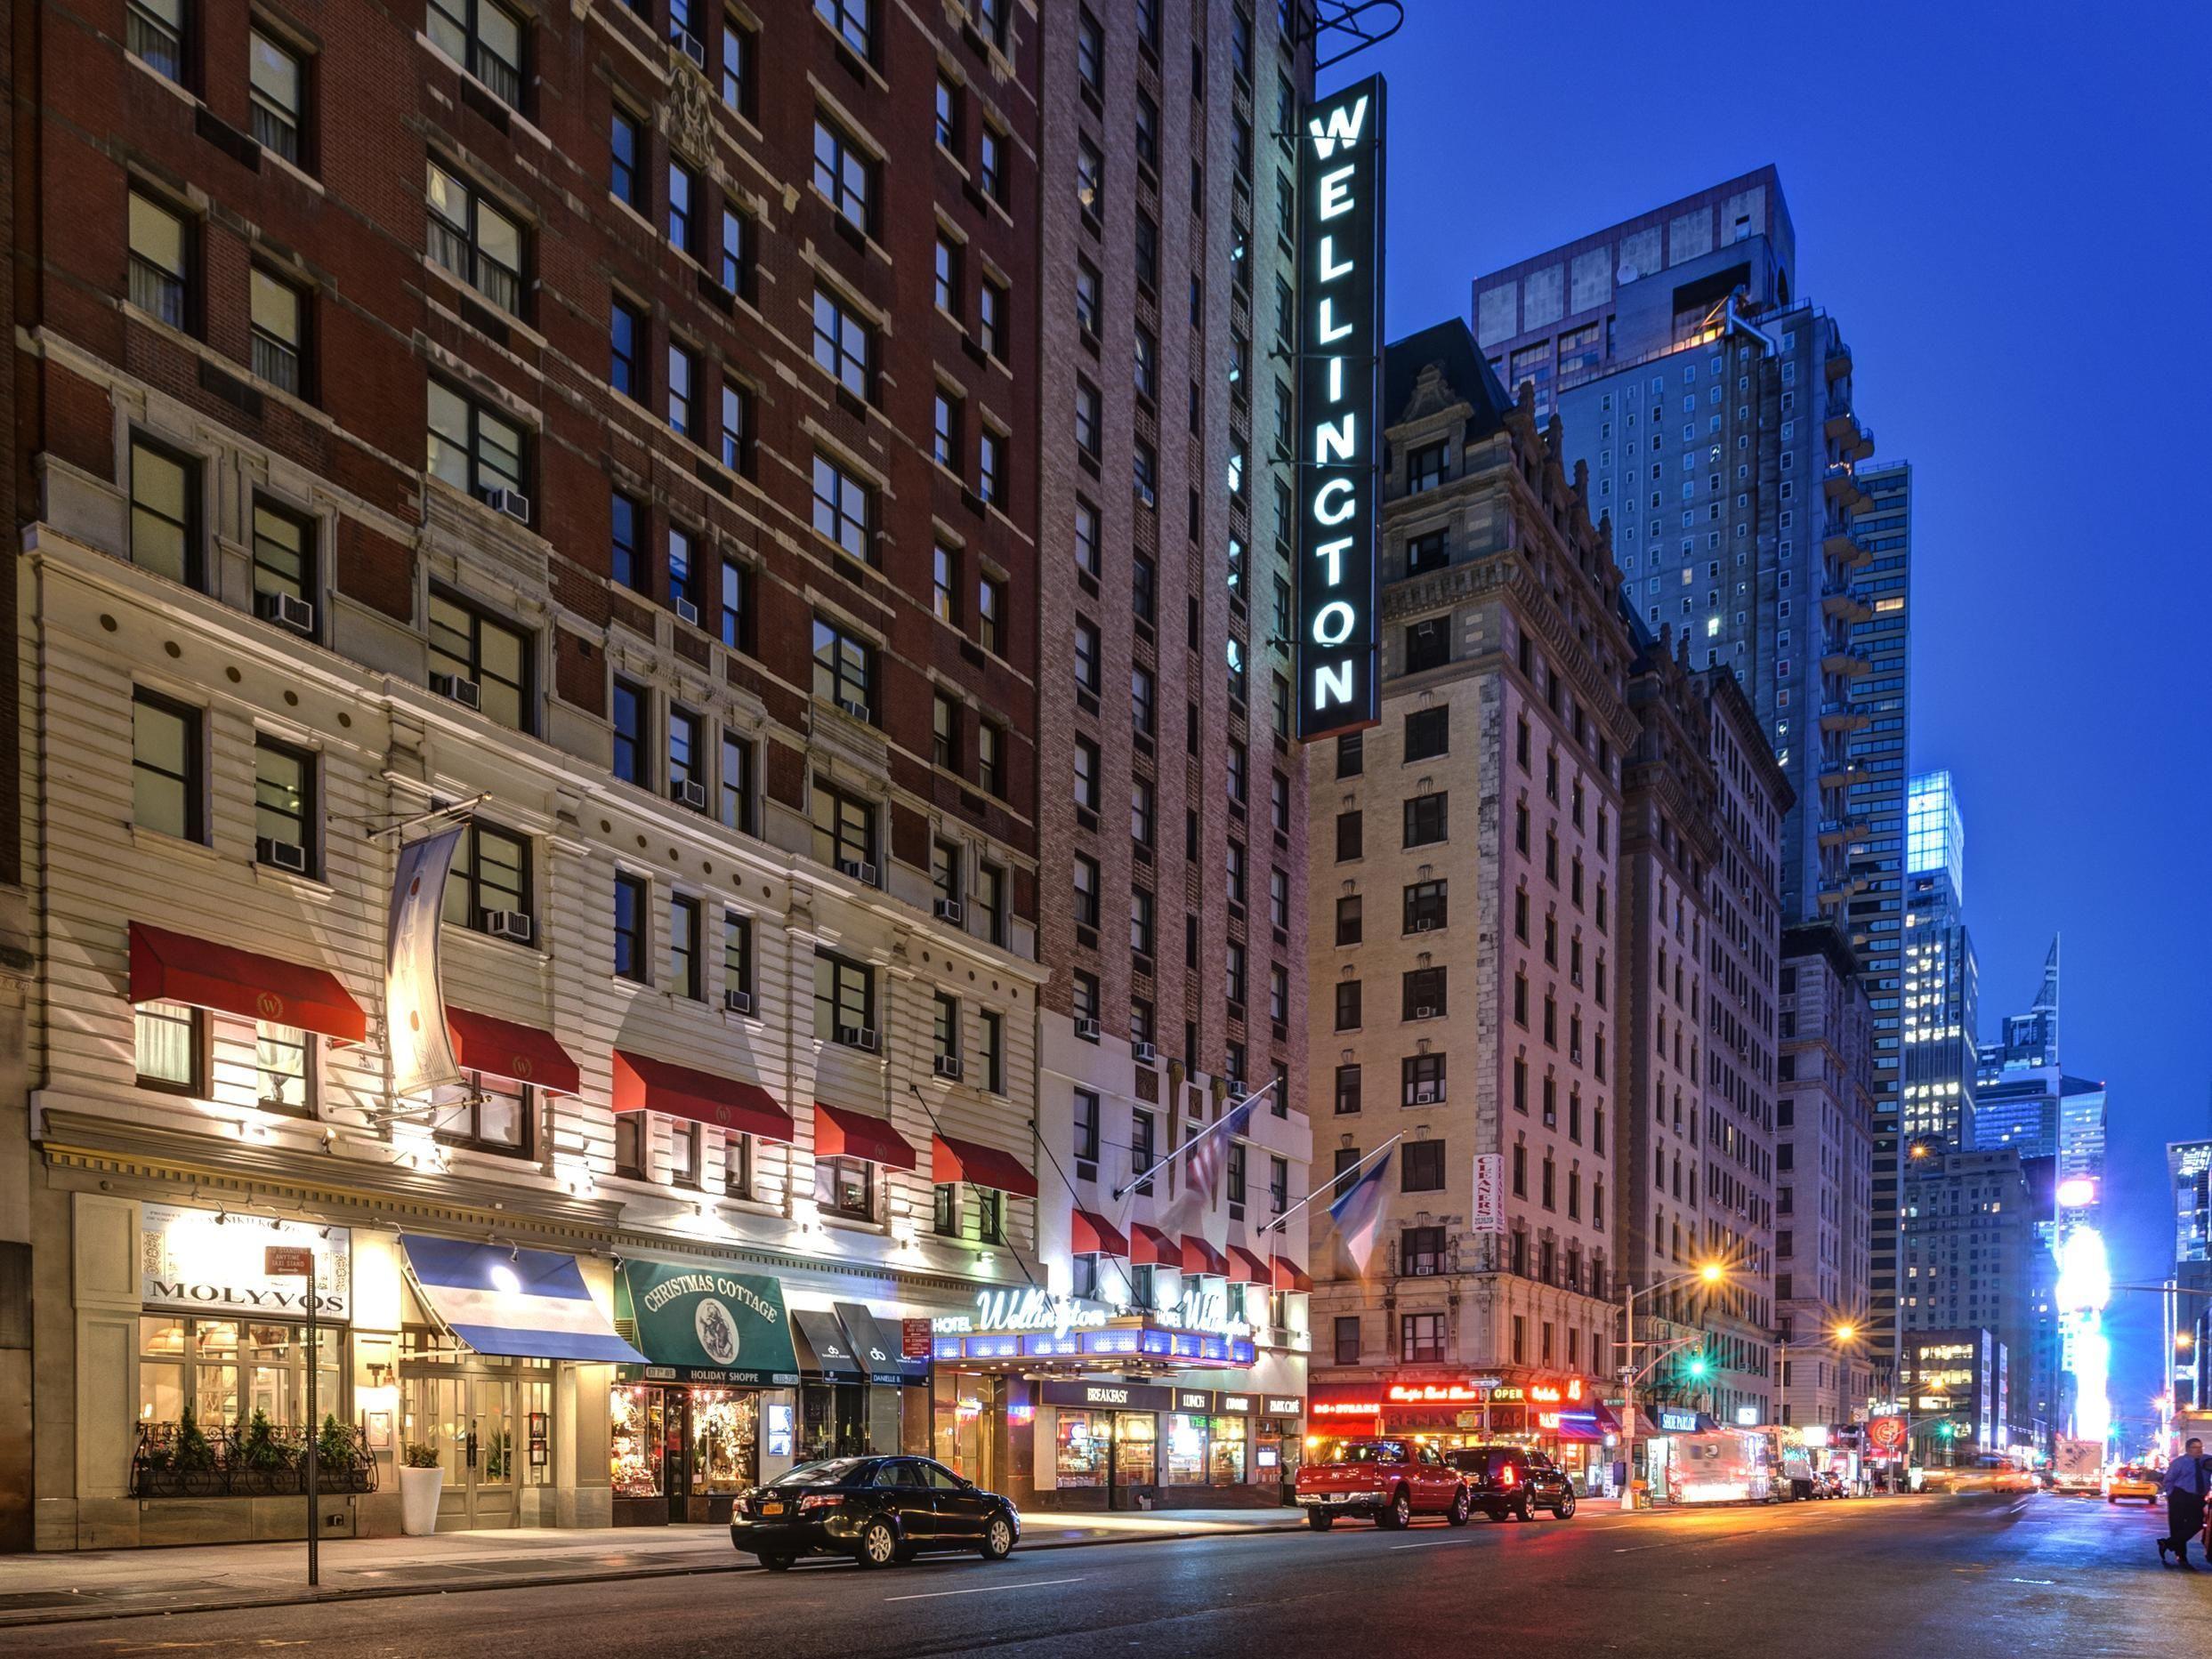 New York (NY) Wellington Hotel United States, North